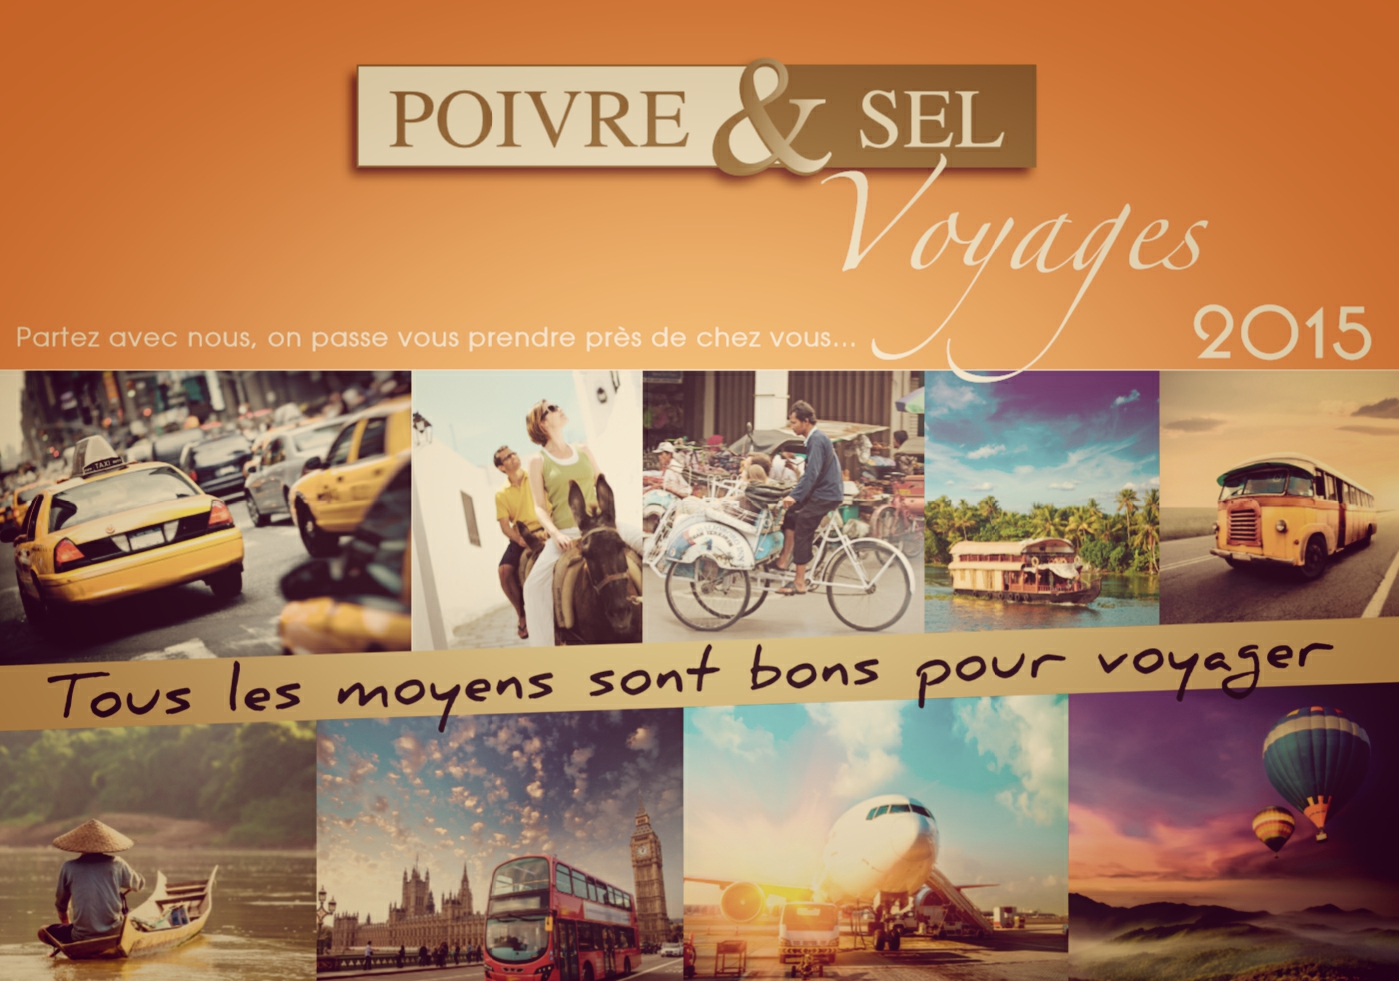 Poivre & Sel Voyages